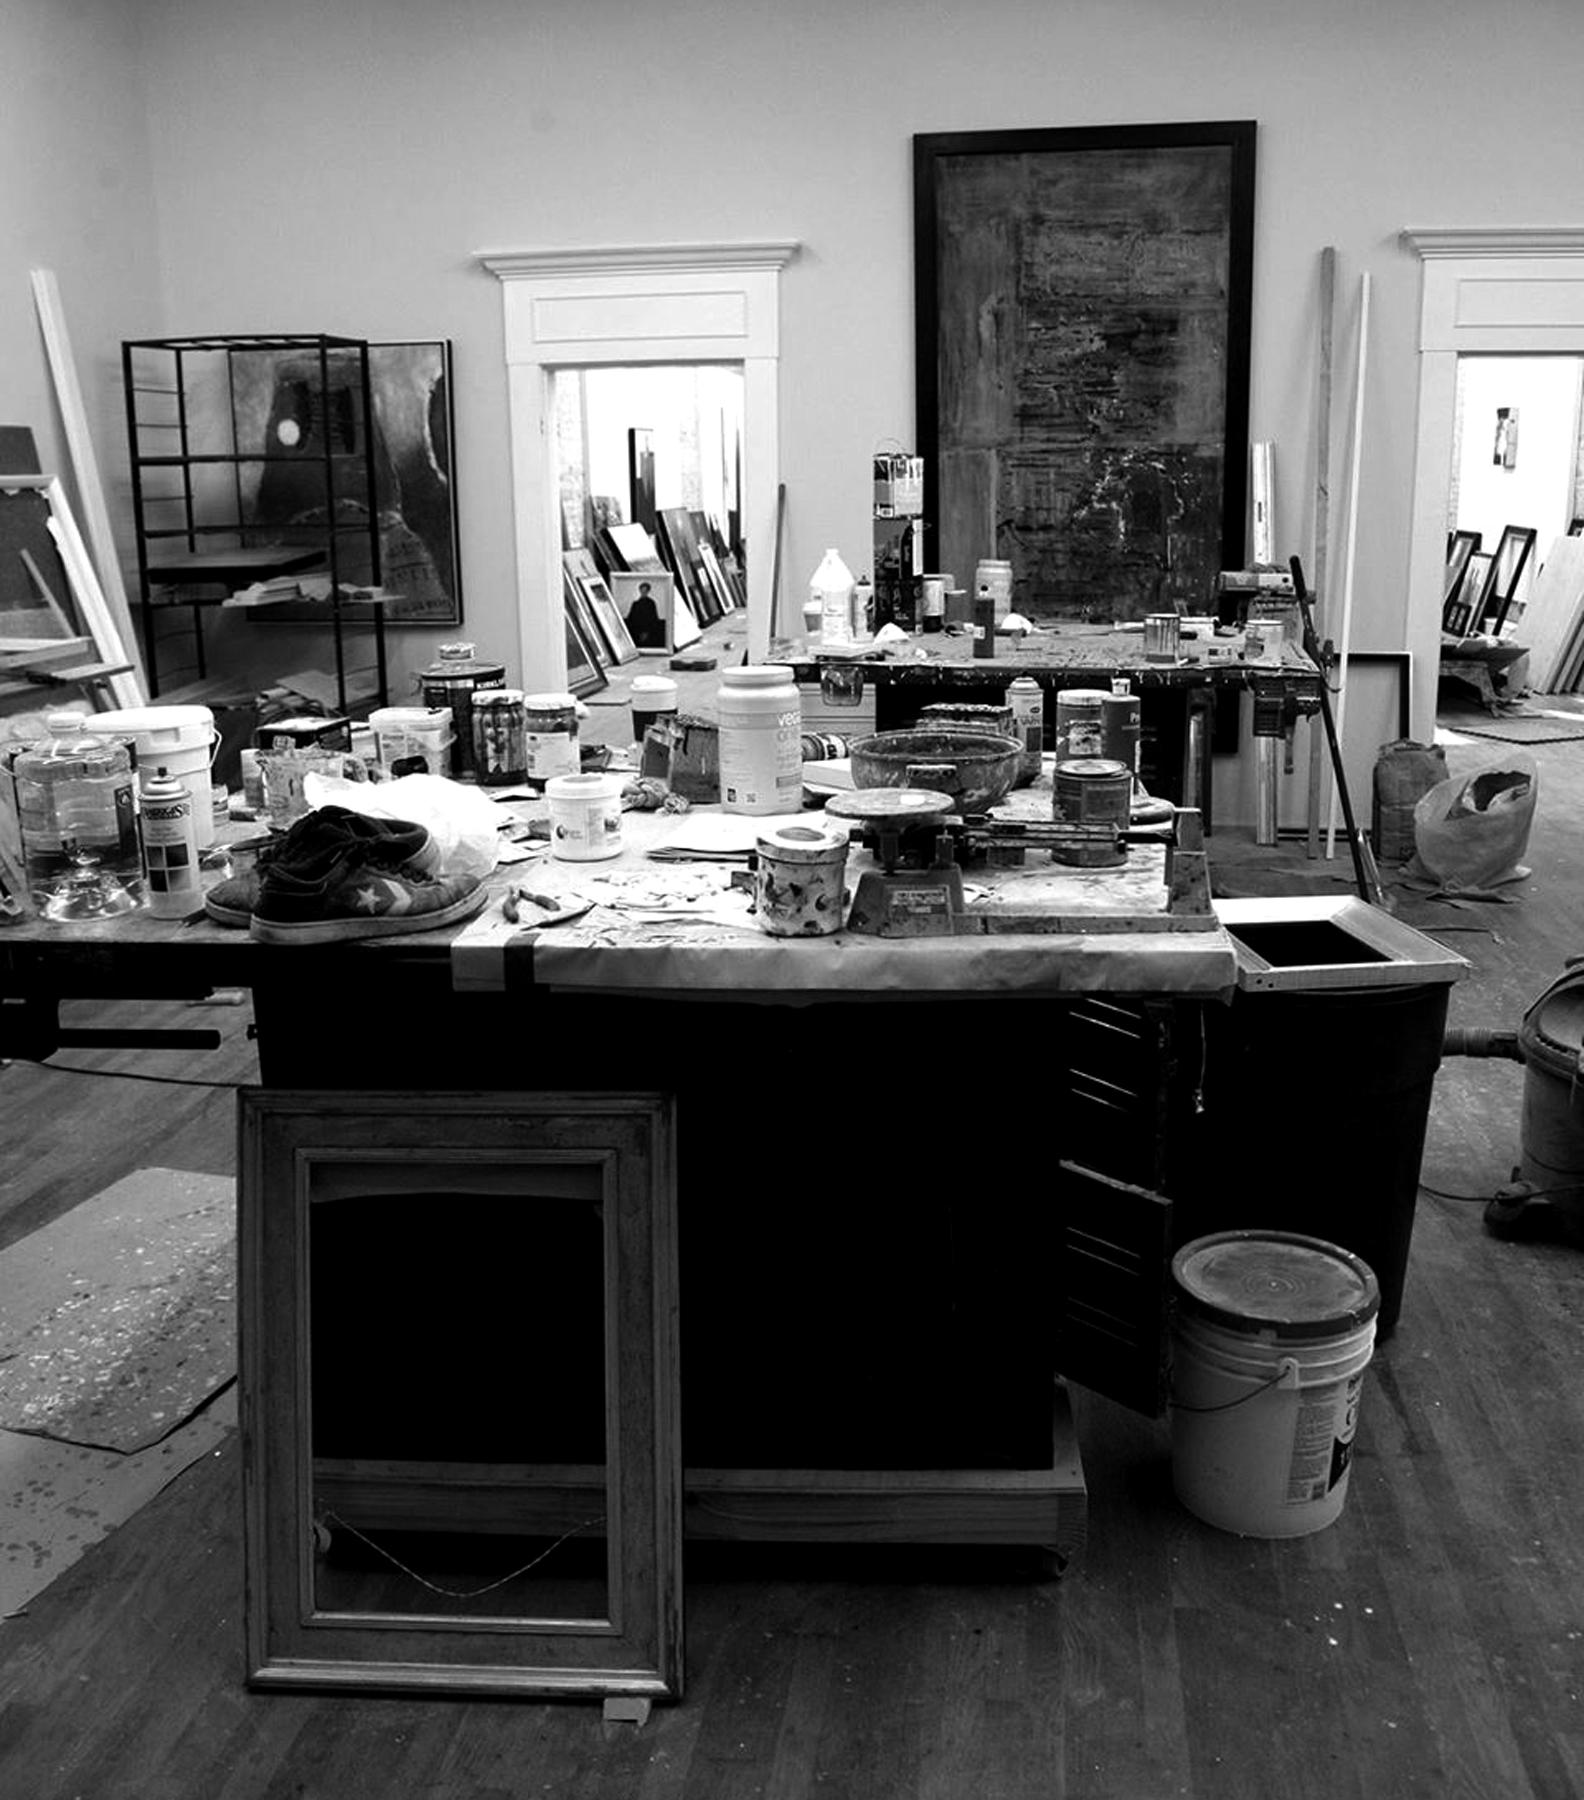 Torrance studio 2017  back area